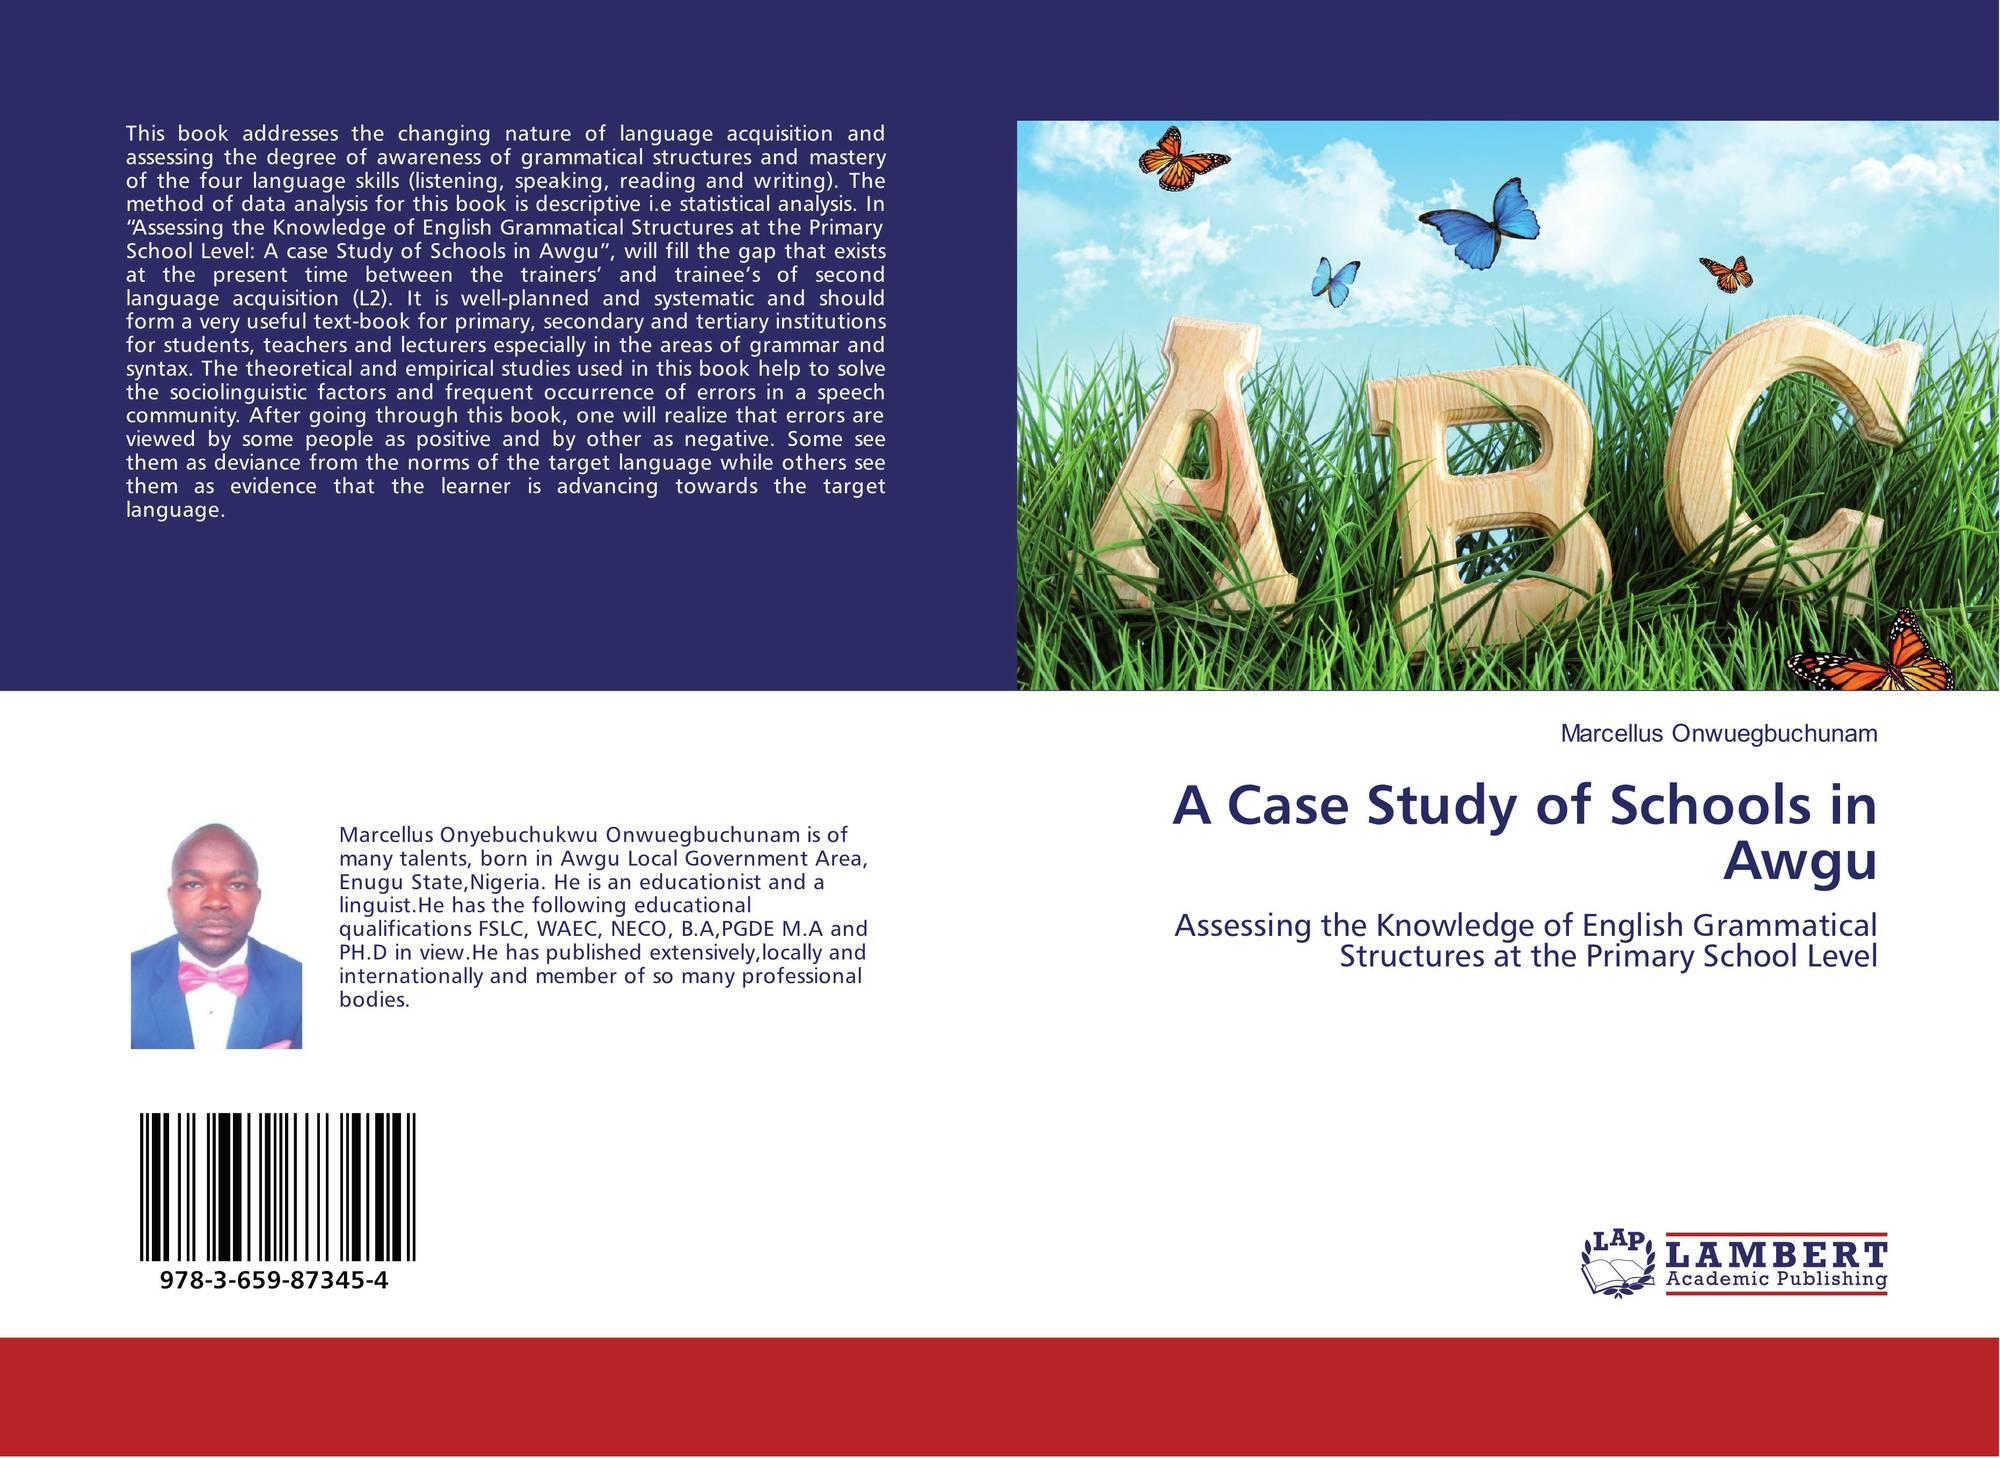 a case study of school